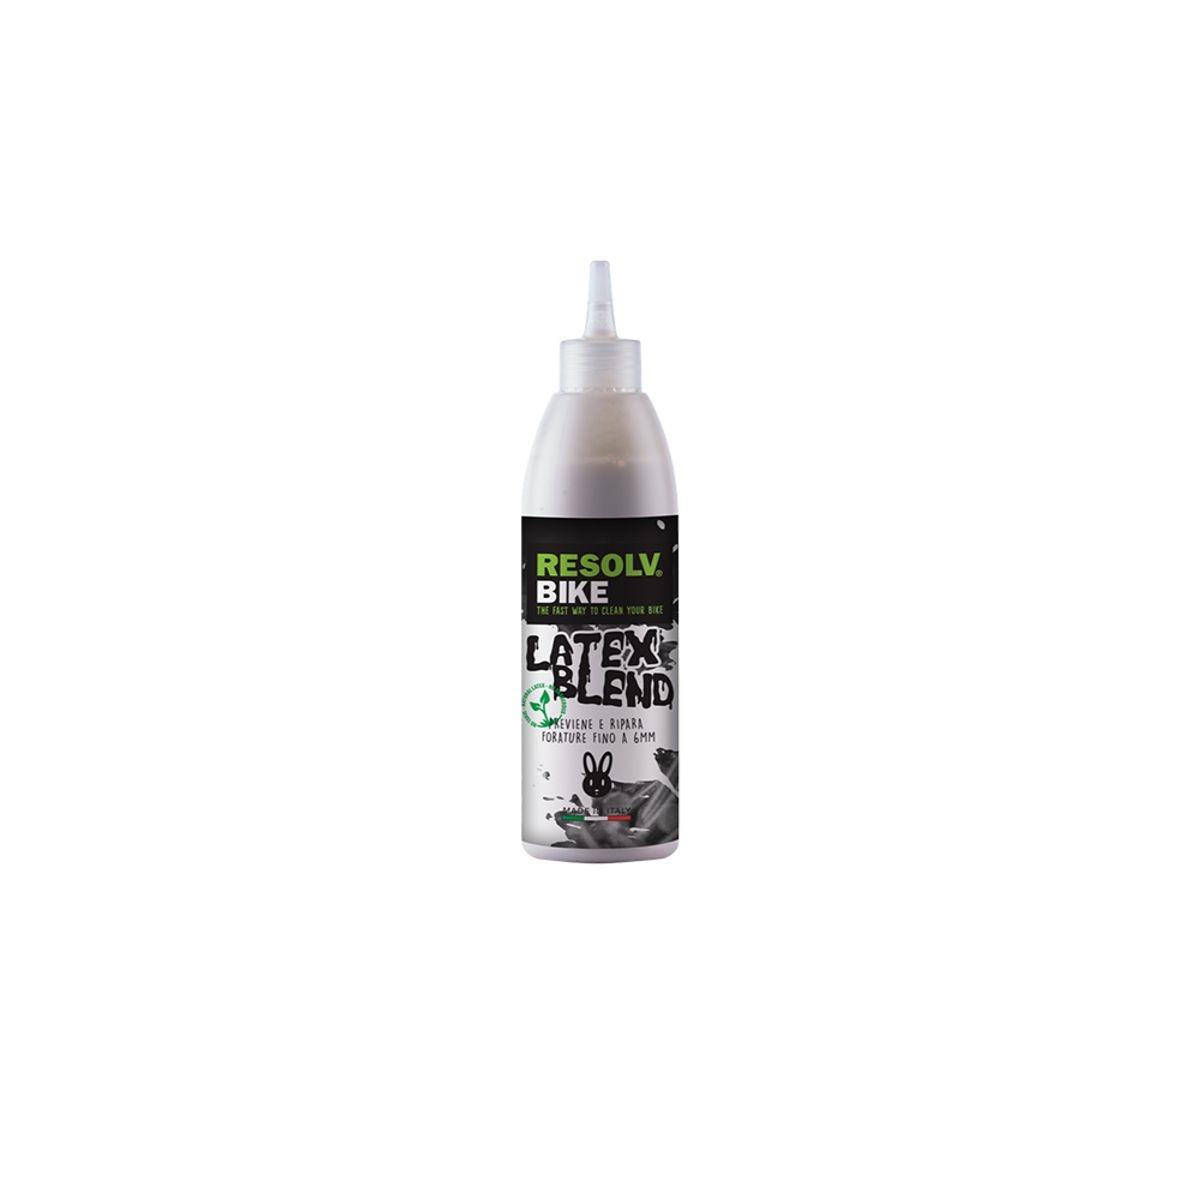 Lattice Sigillante Mtb Latex Blend 250ml